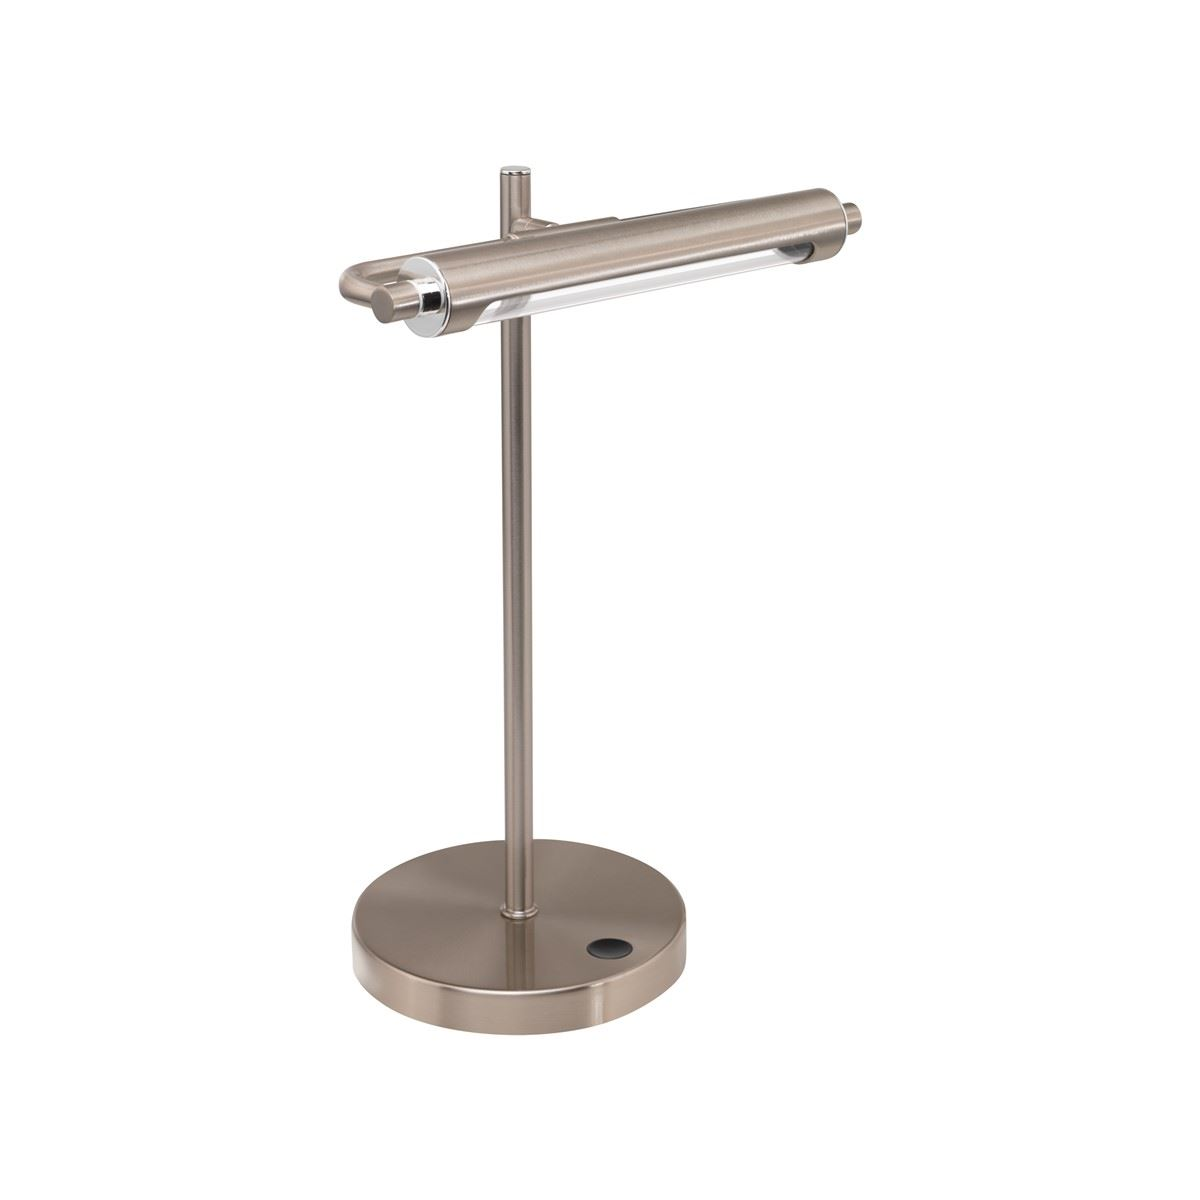 Silver Steel Children LED Table Lamp & Touch Dimmer Light